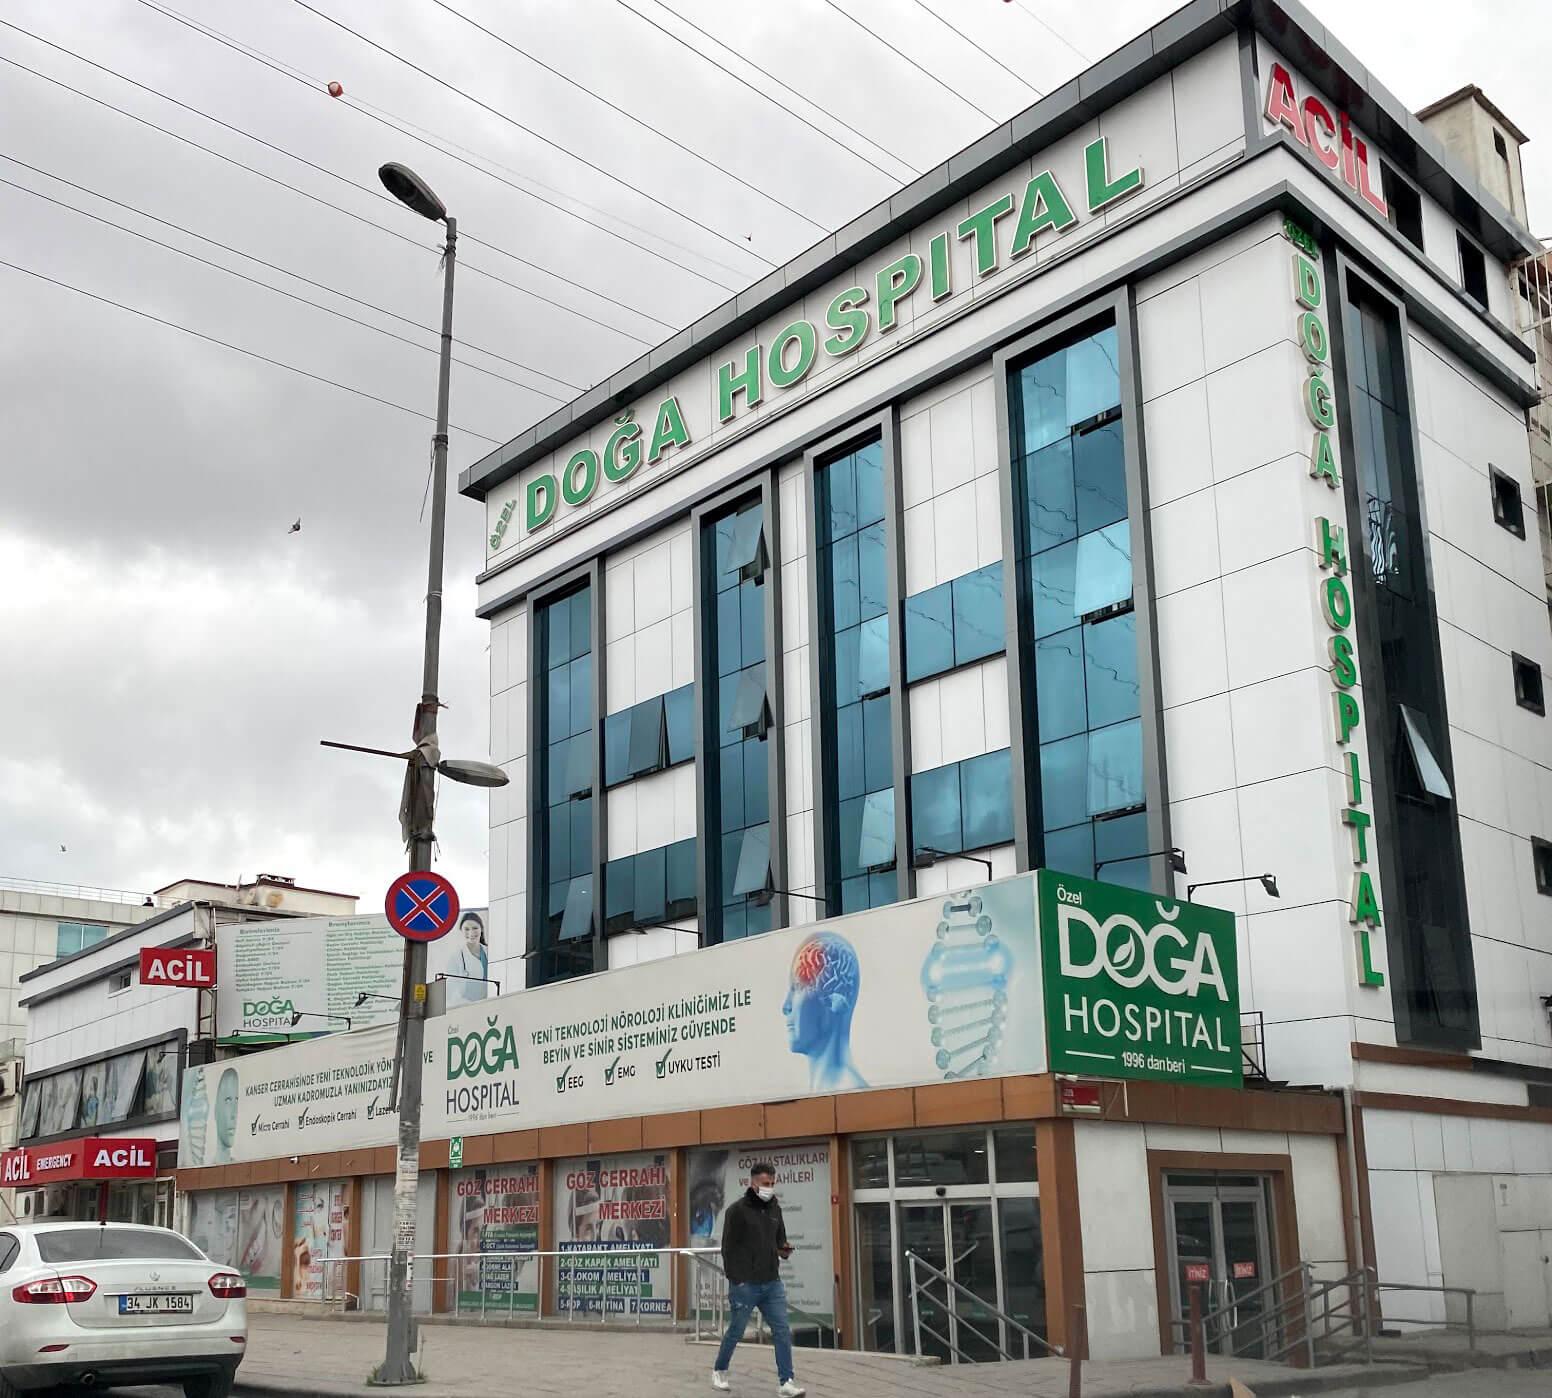 Doga Hospital   damasturk Real Estate